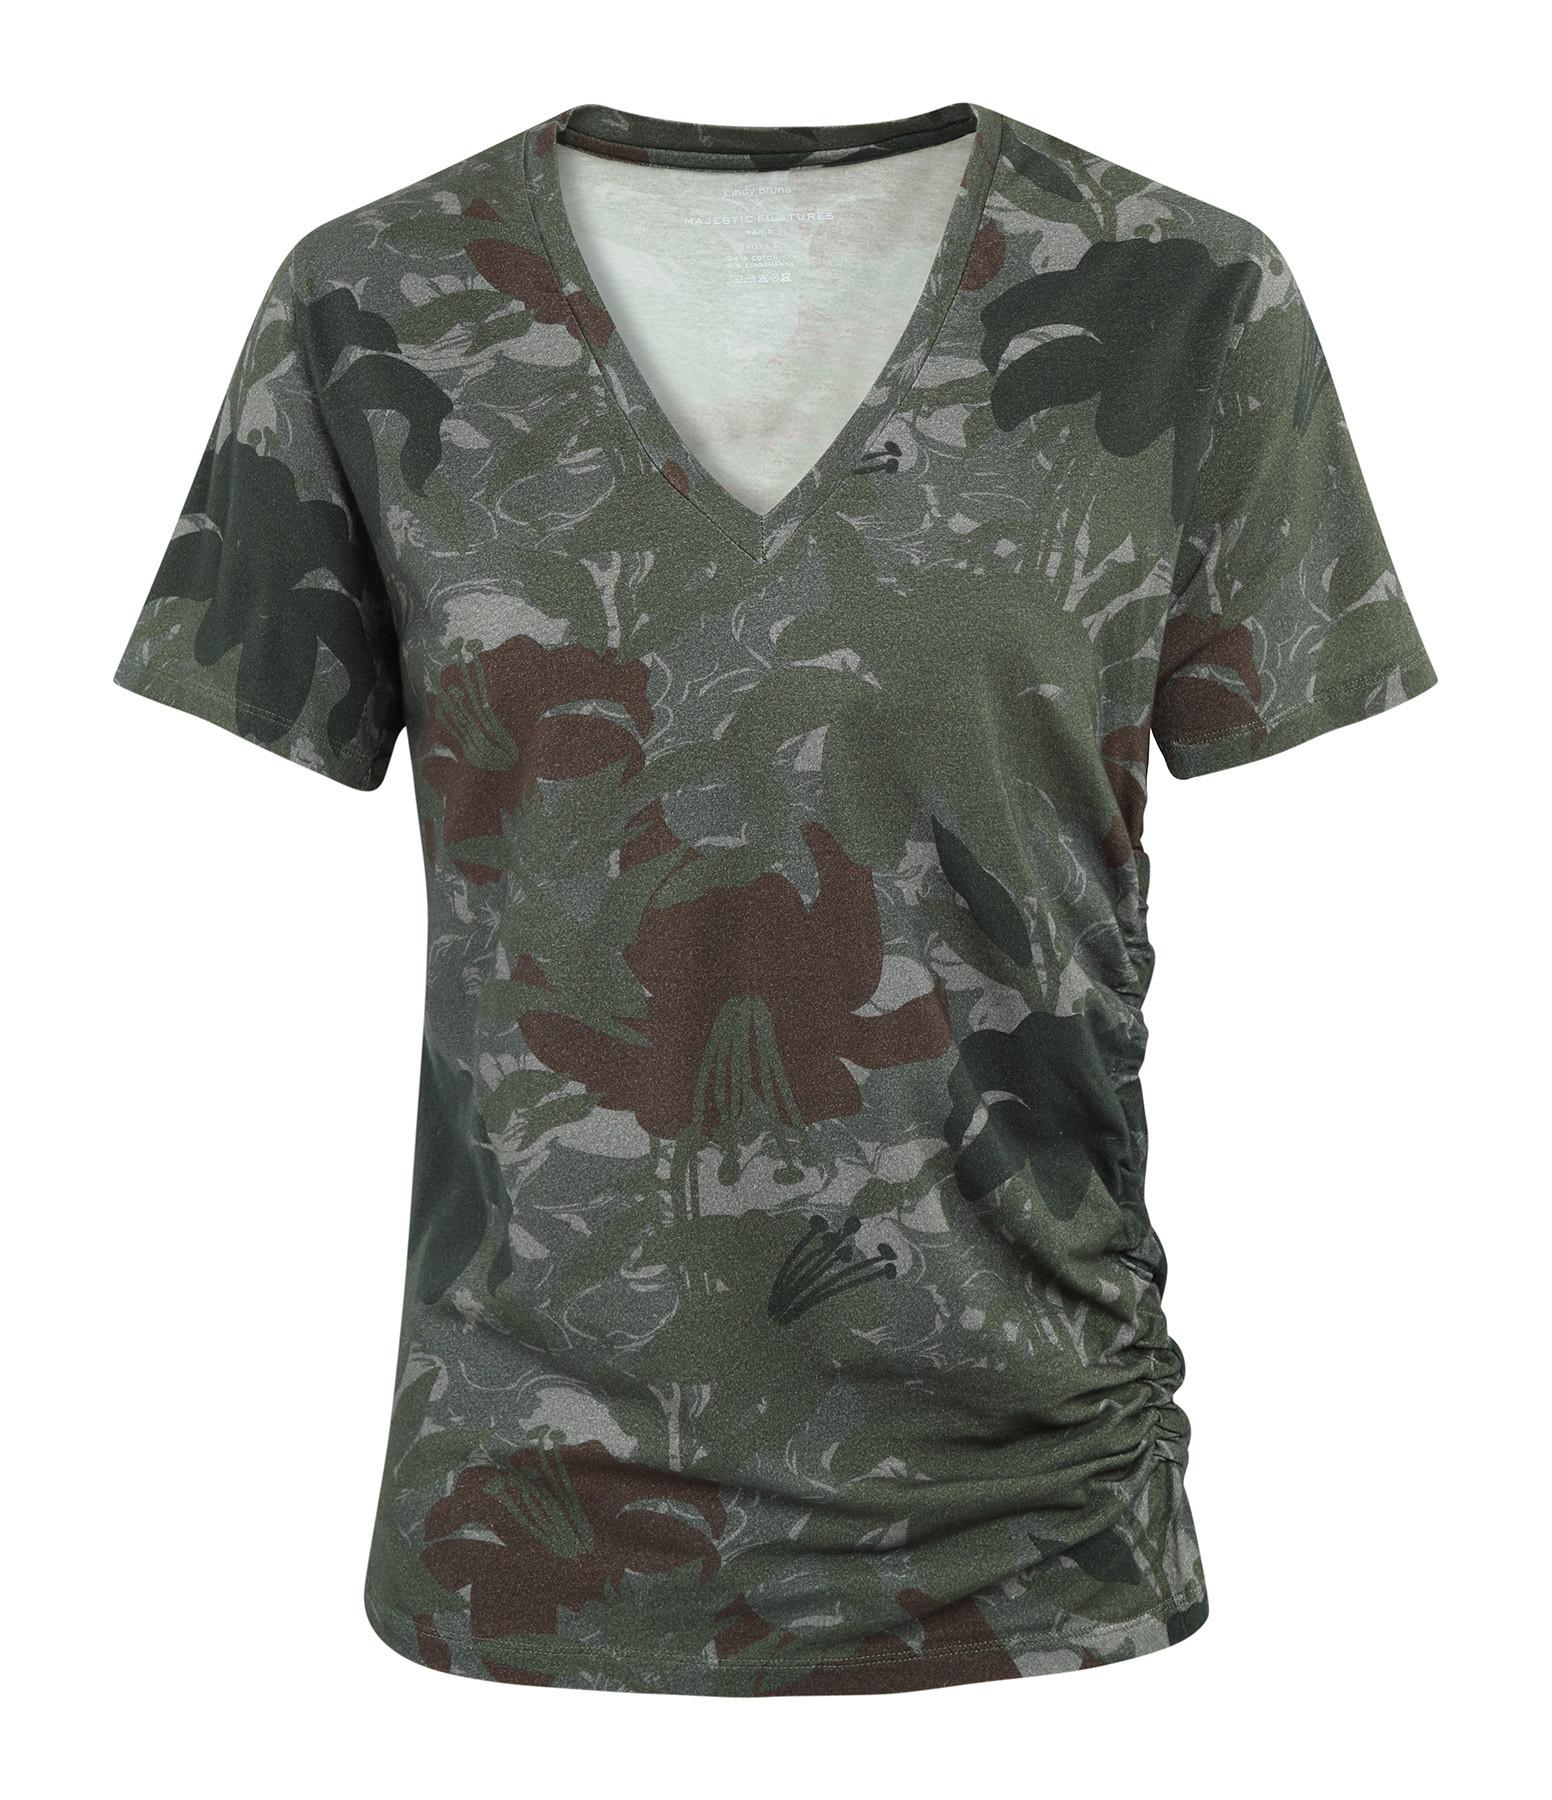 MAJESTIC FILATURES - Tee-shirt Col V Coton Vert Treillis, Cindy Bruna